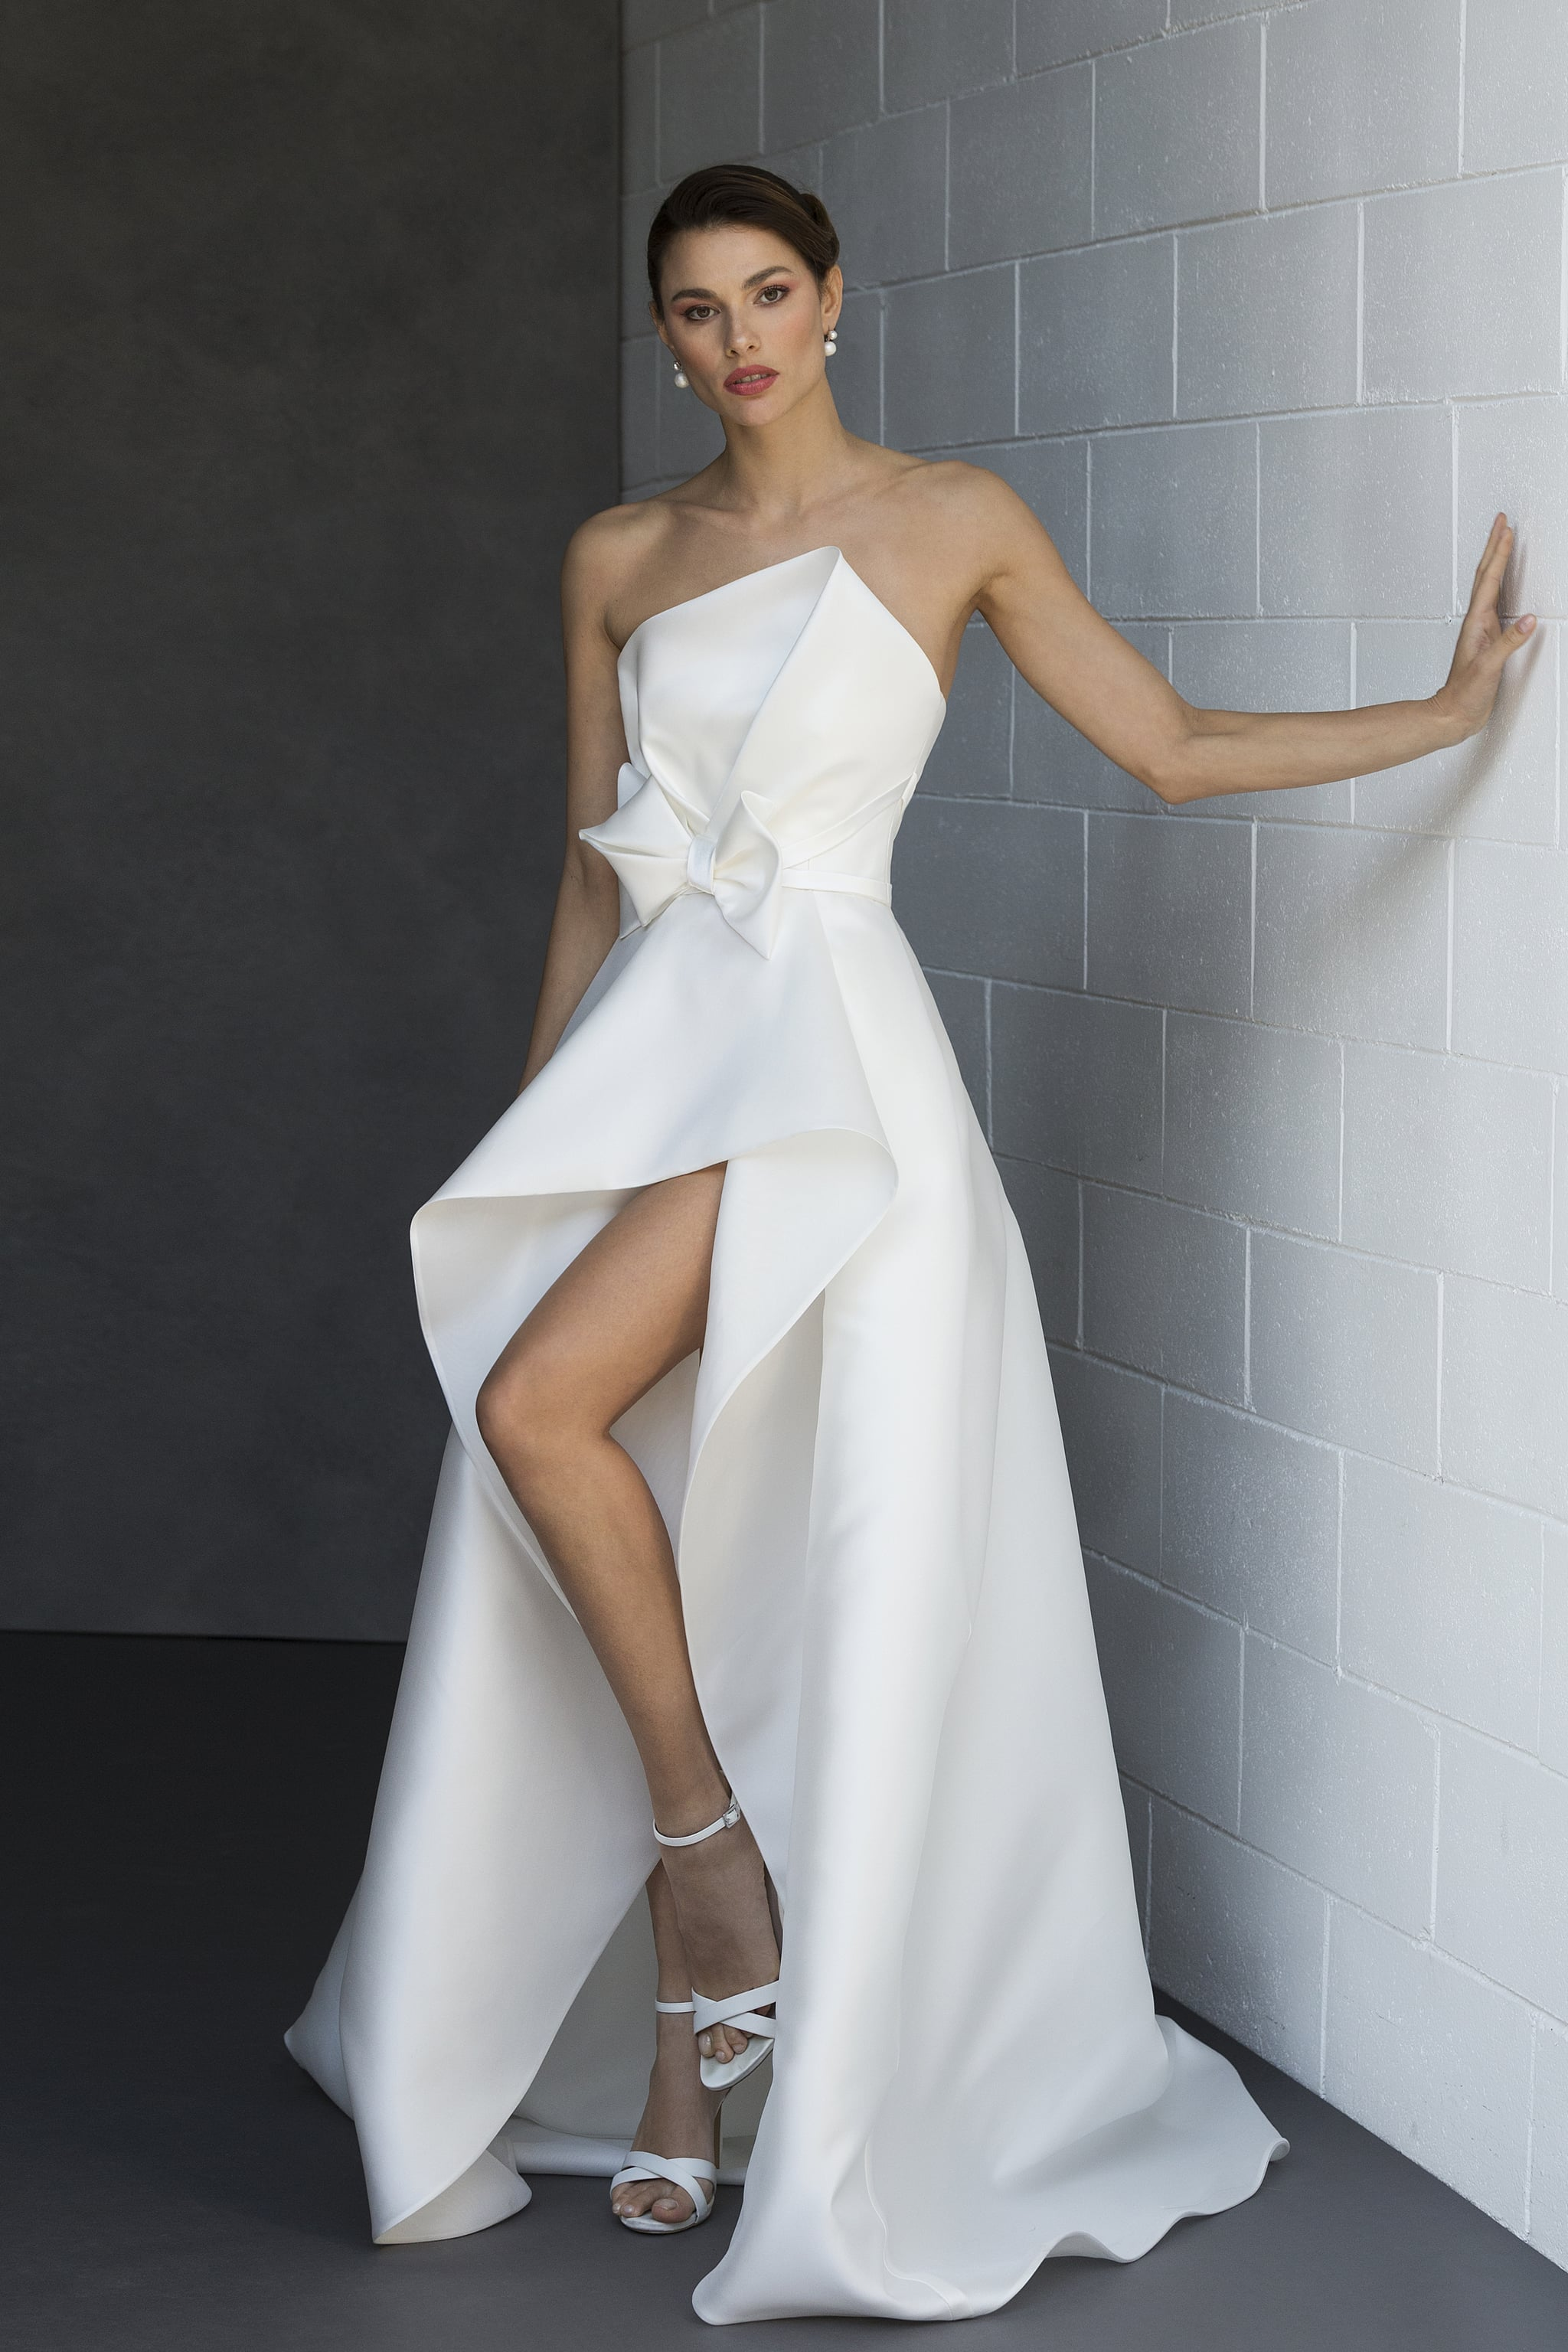 new products 1b61b c4e06 Valentini Spose Spring 2020 | Spring 2020's Biggest Bridal ...